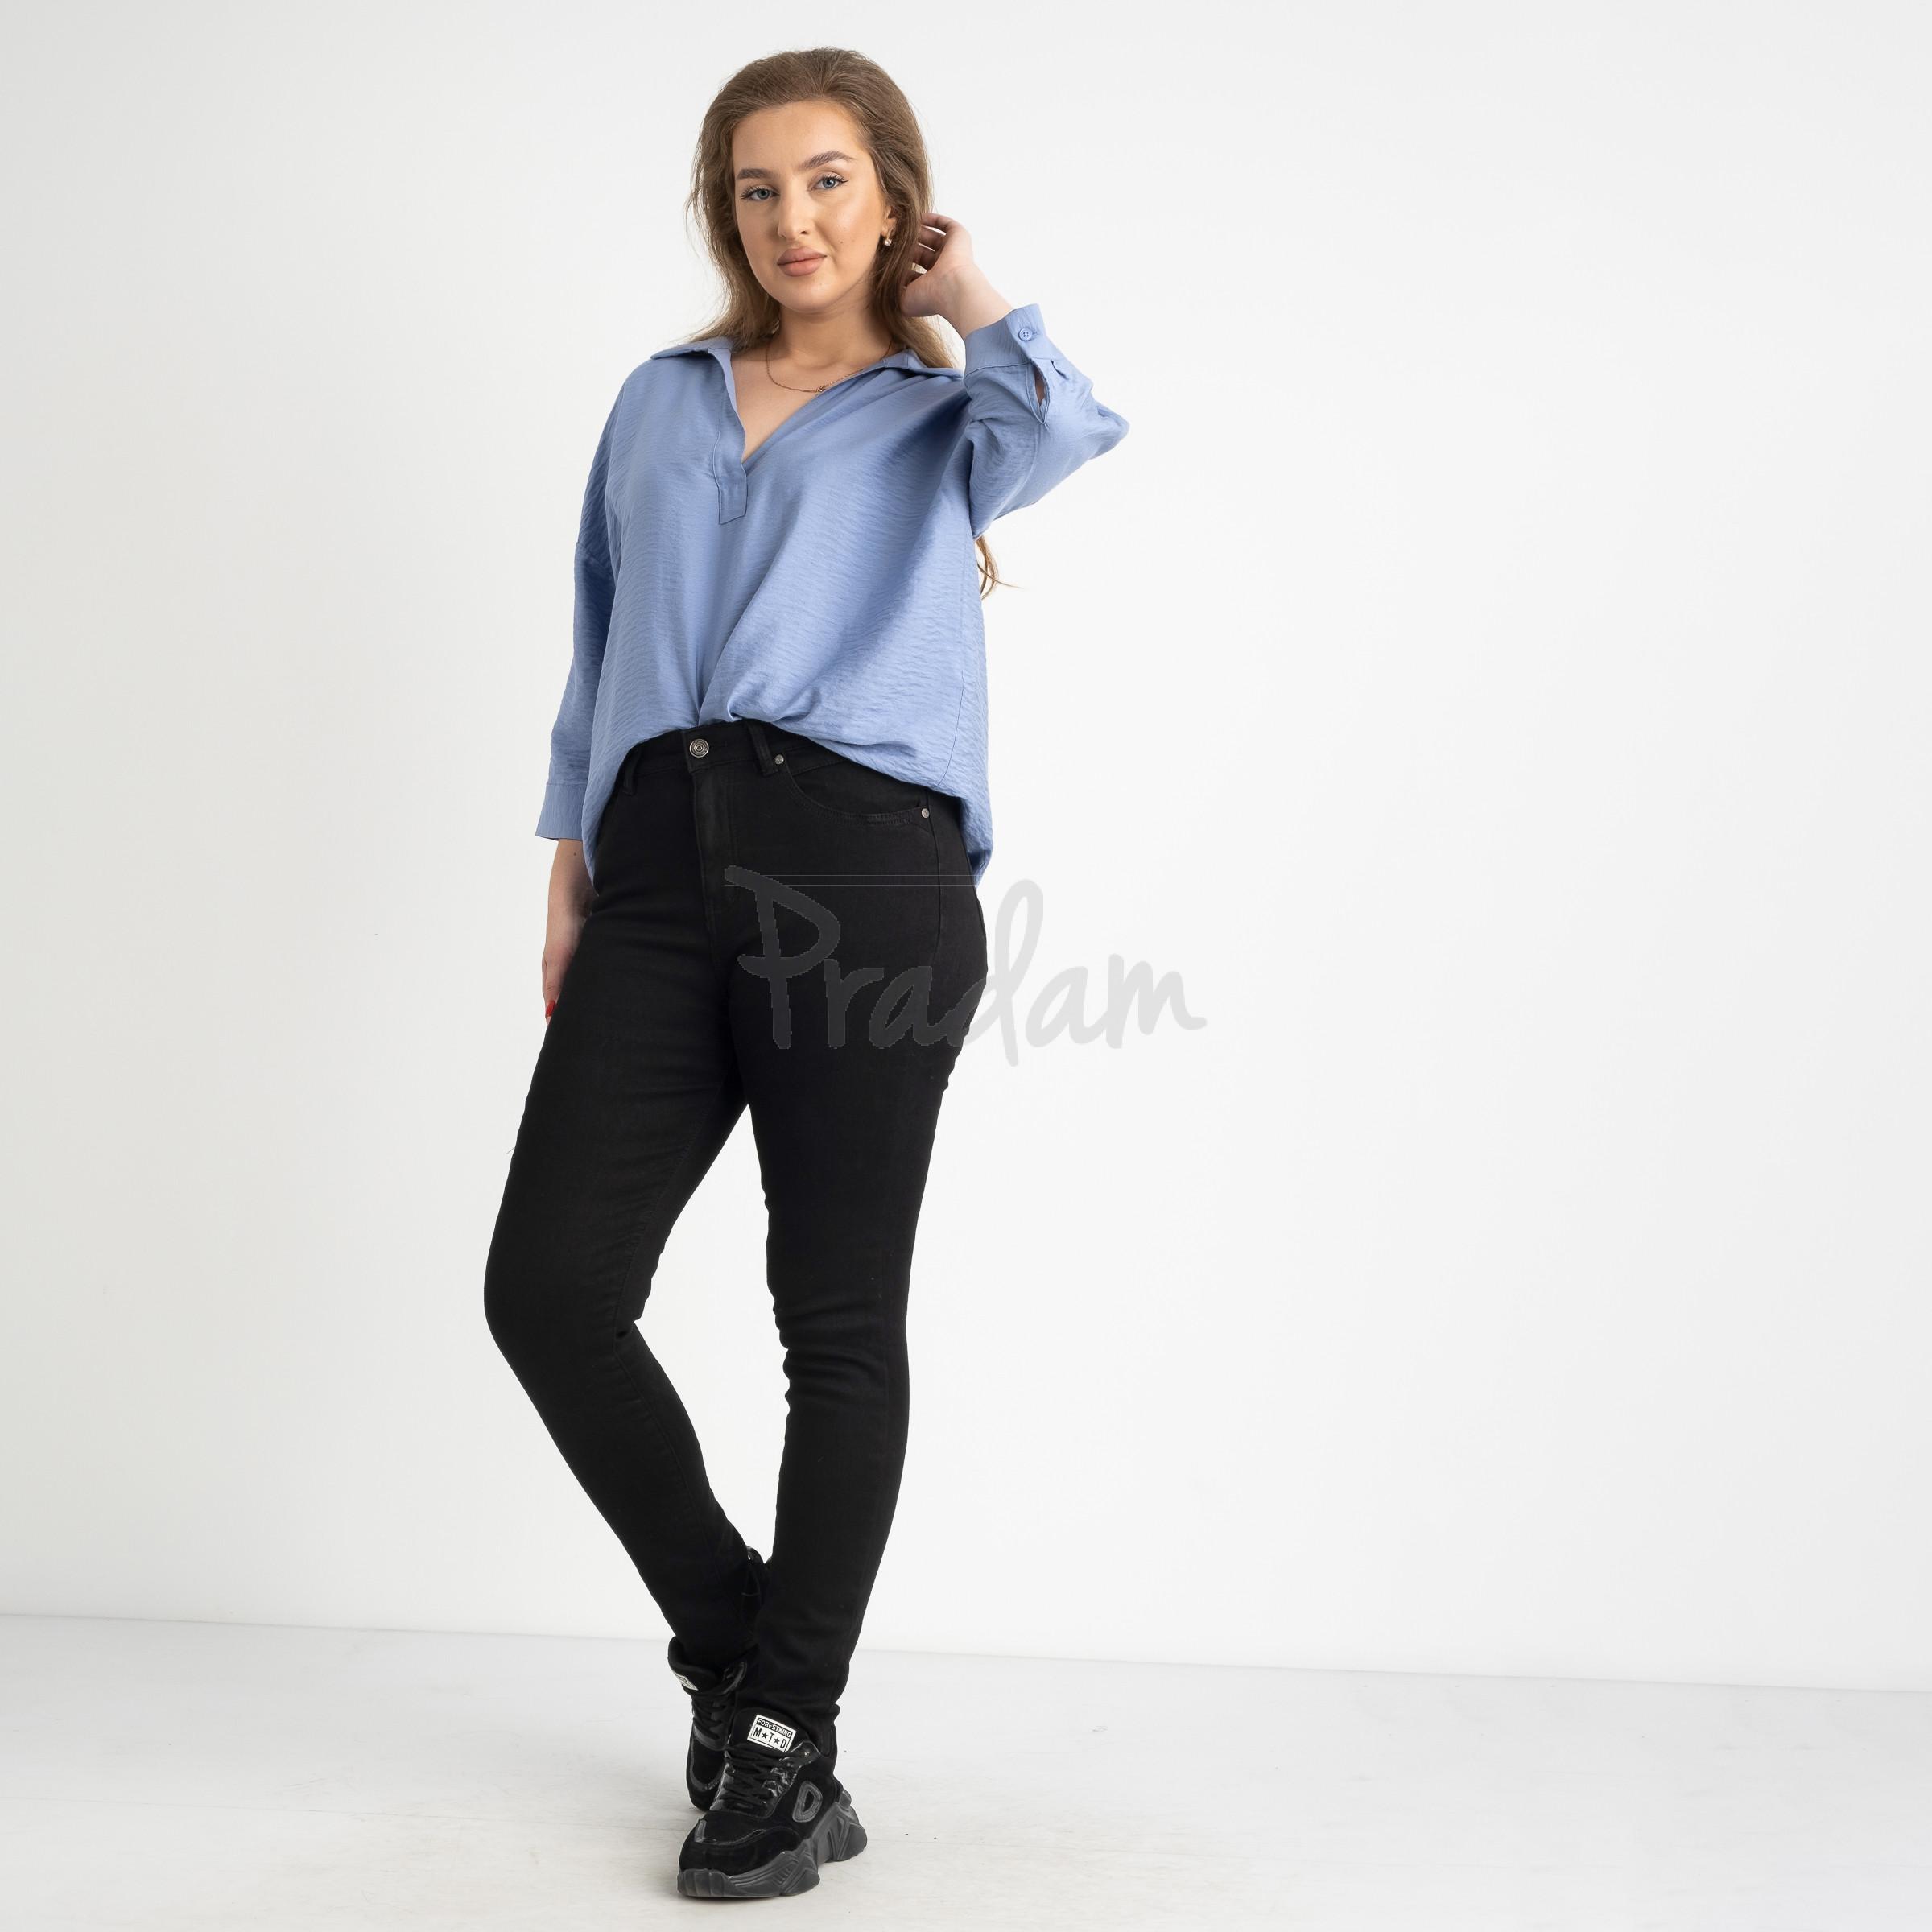 6035 New Jeans американка на флисе полубатальная черная  стрейчевая (6 ед.размеры: 28.29.30.31.32.33)